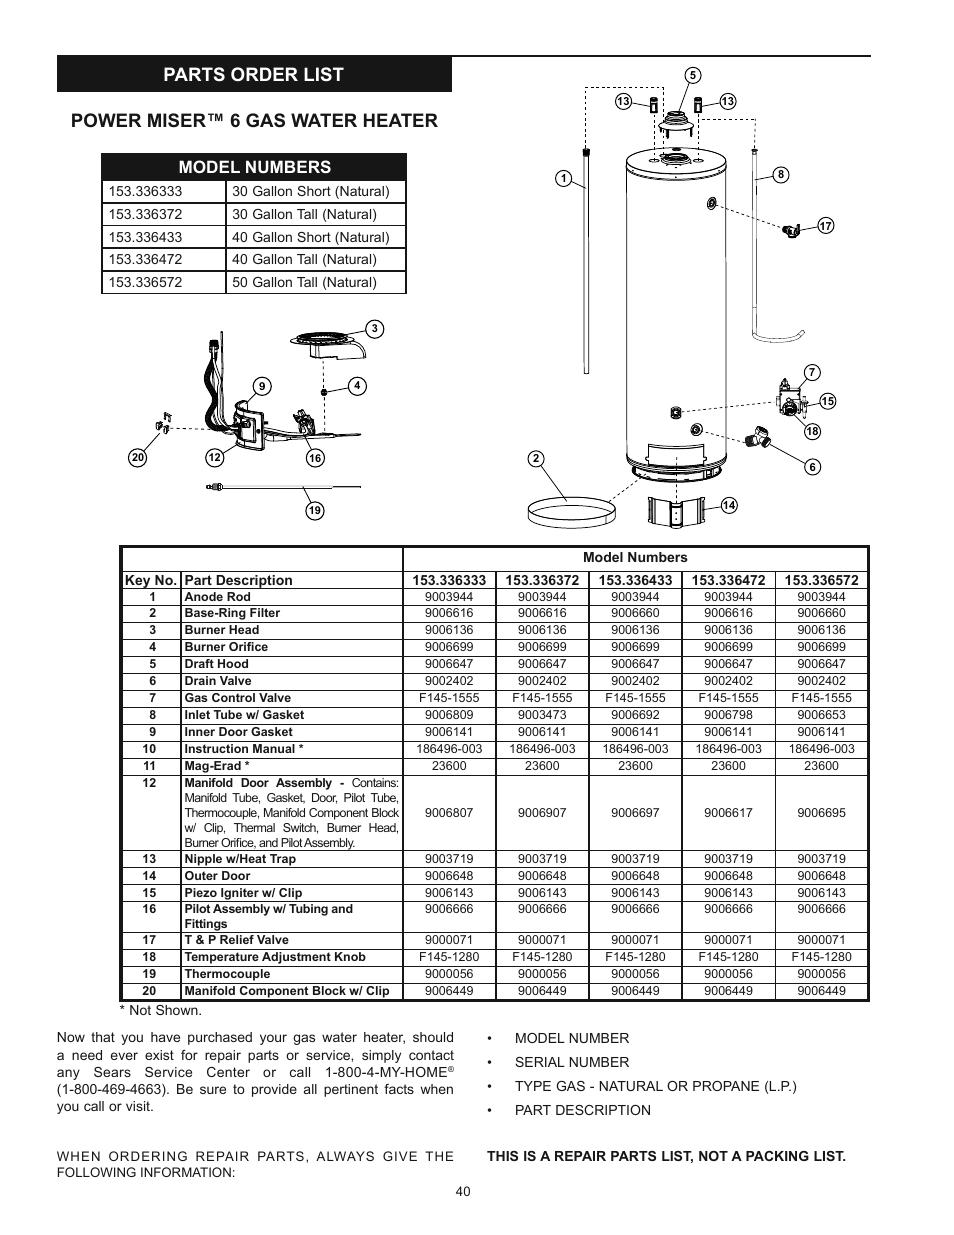 power miser 6 gas water heater parts order list model. Black Bedroom Furniture Sets. Home Design Ideas